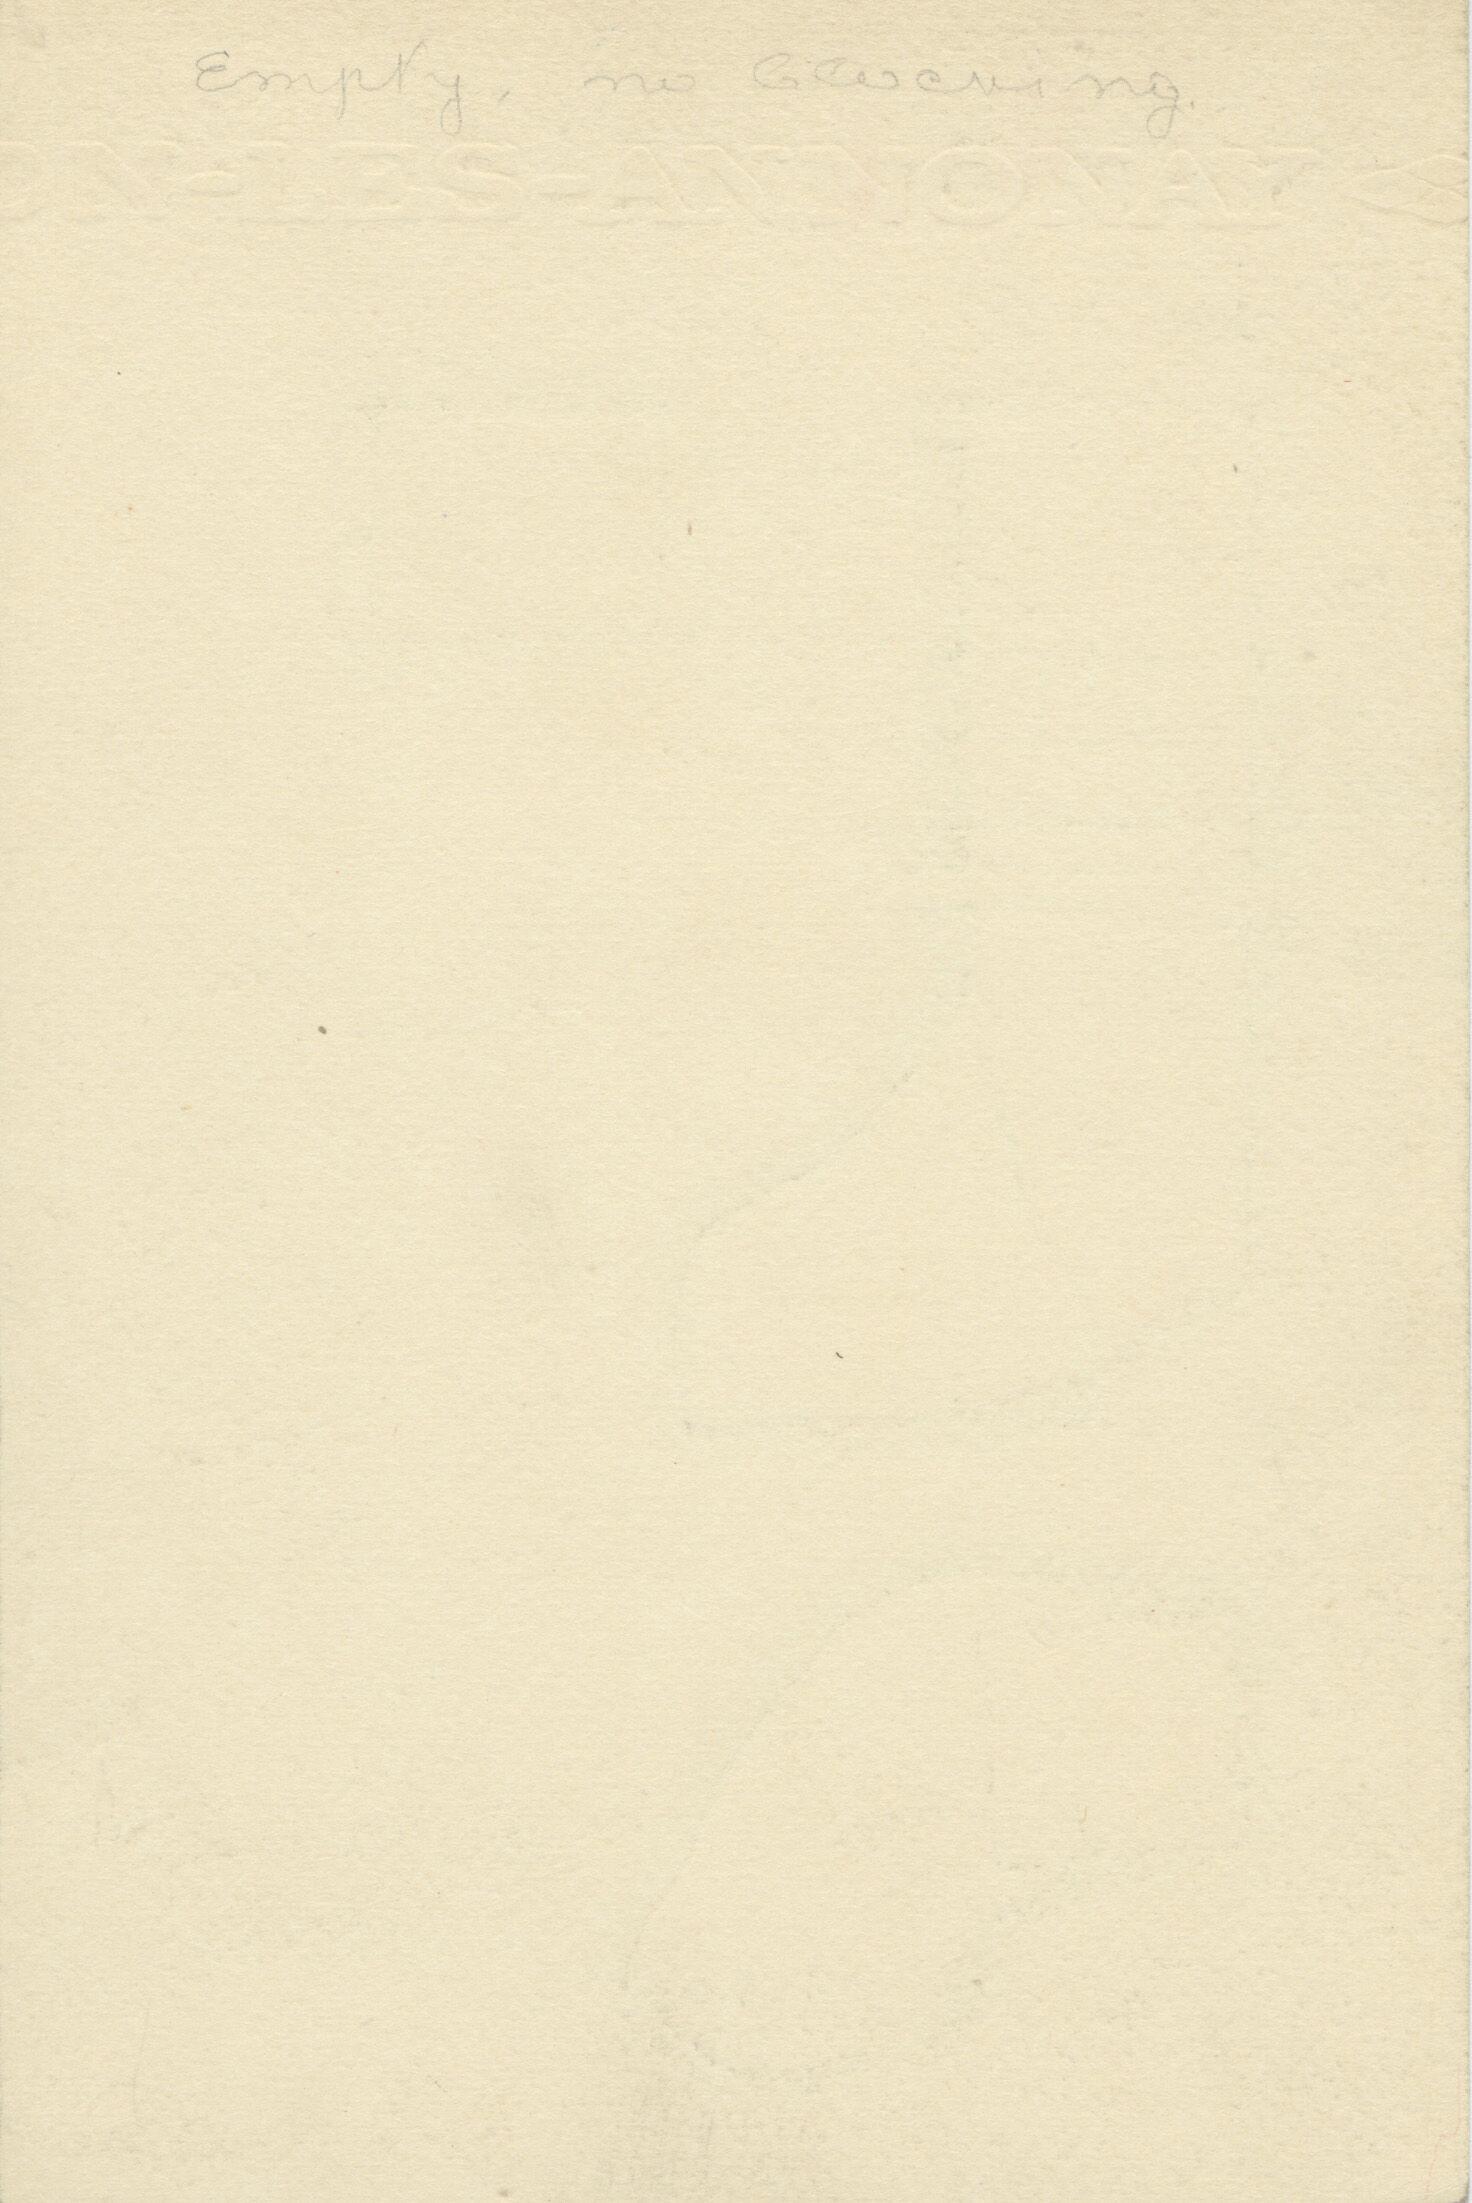 Notes: G 1158, Shaft D, notes